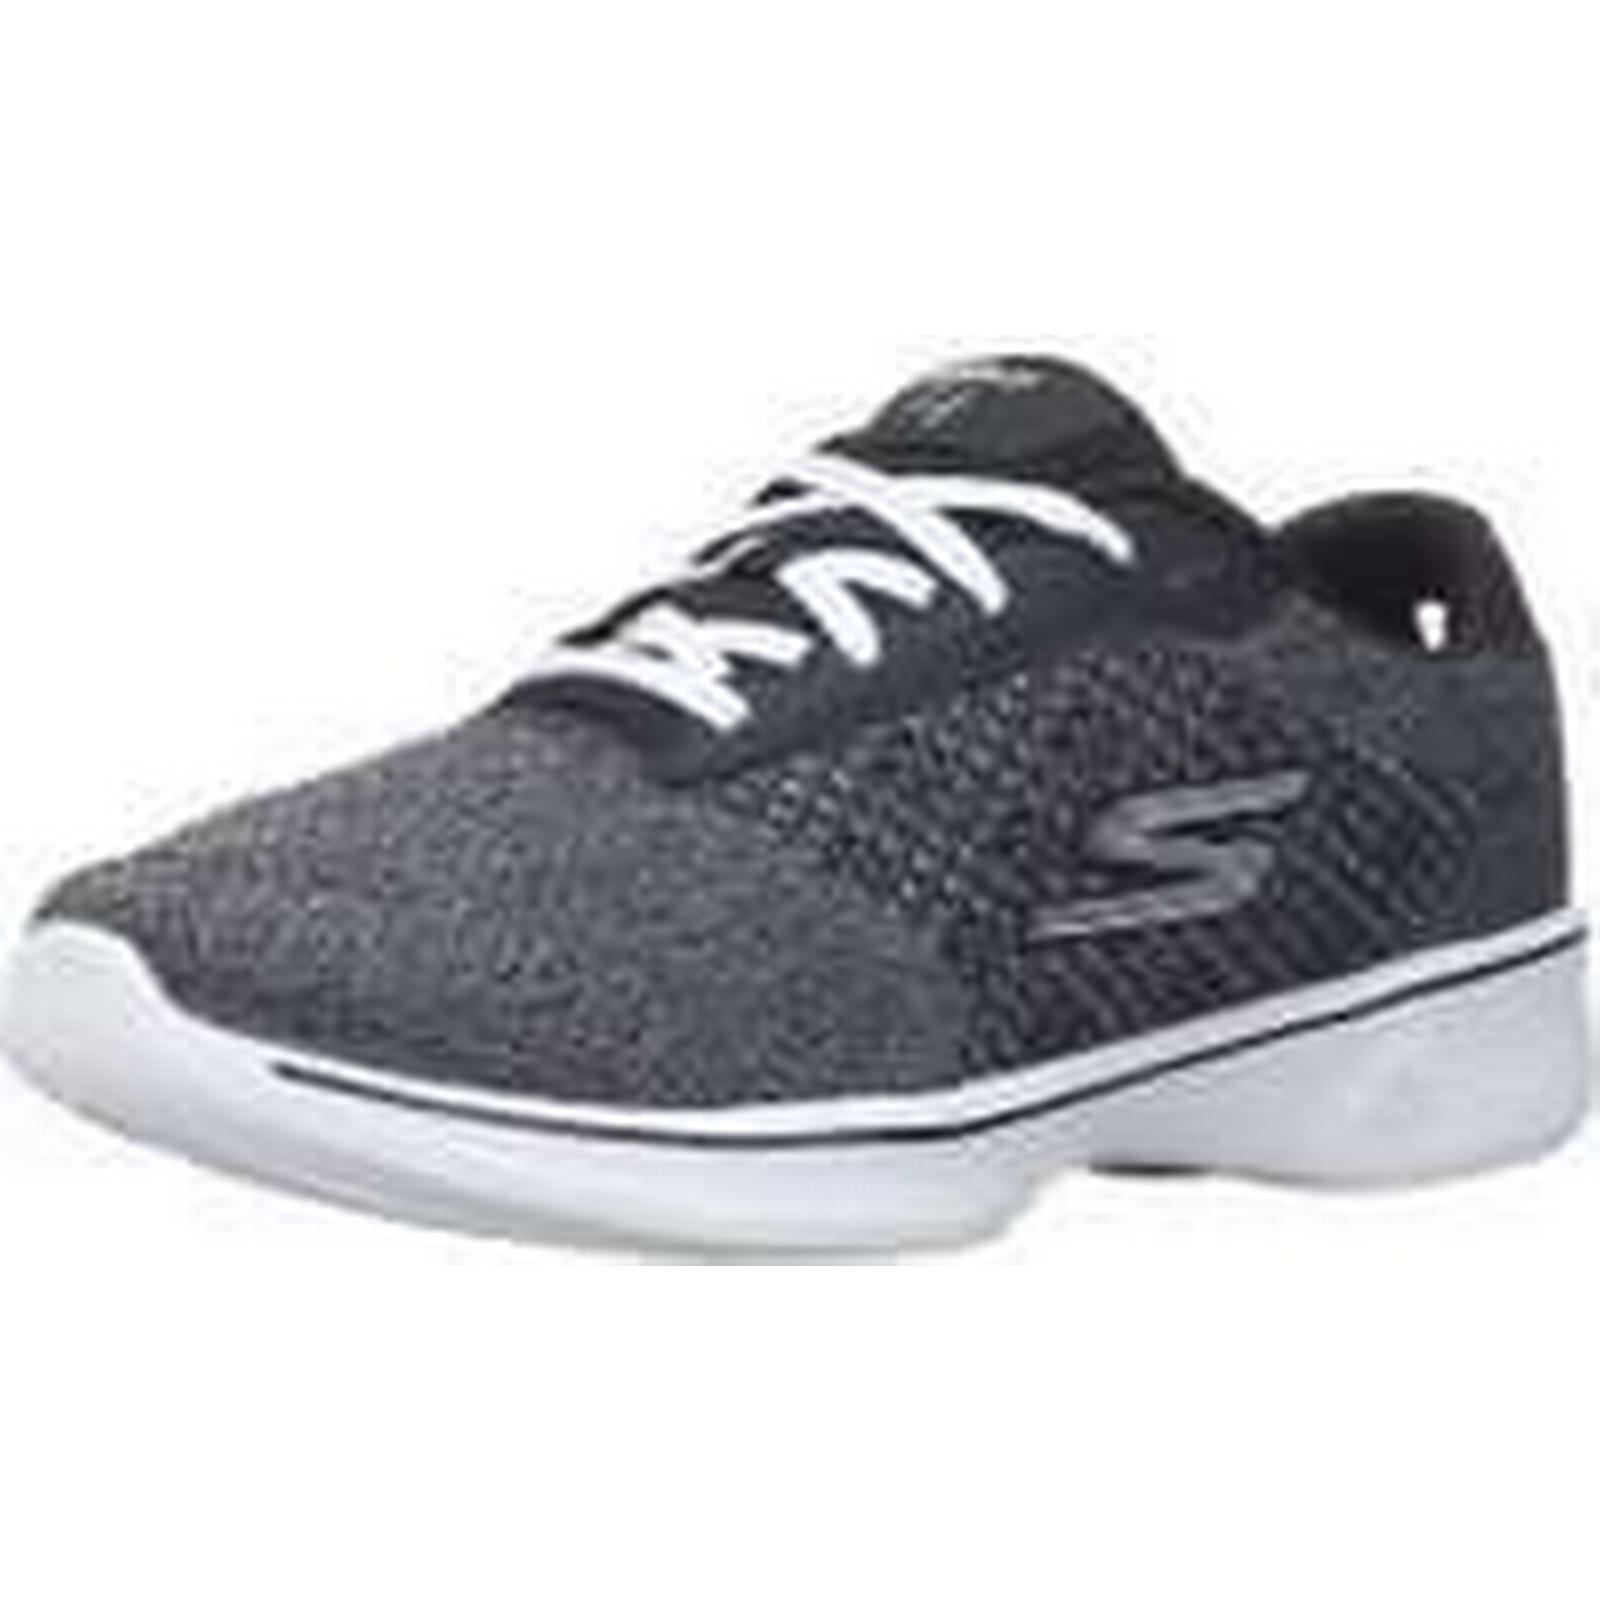 Skechers Go Walking Walk 4 Exceed Ladies Walking Go Shoes SS17 - Black/White, 7.5 UK 84639e